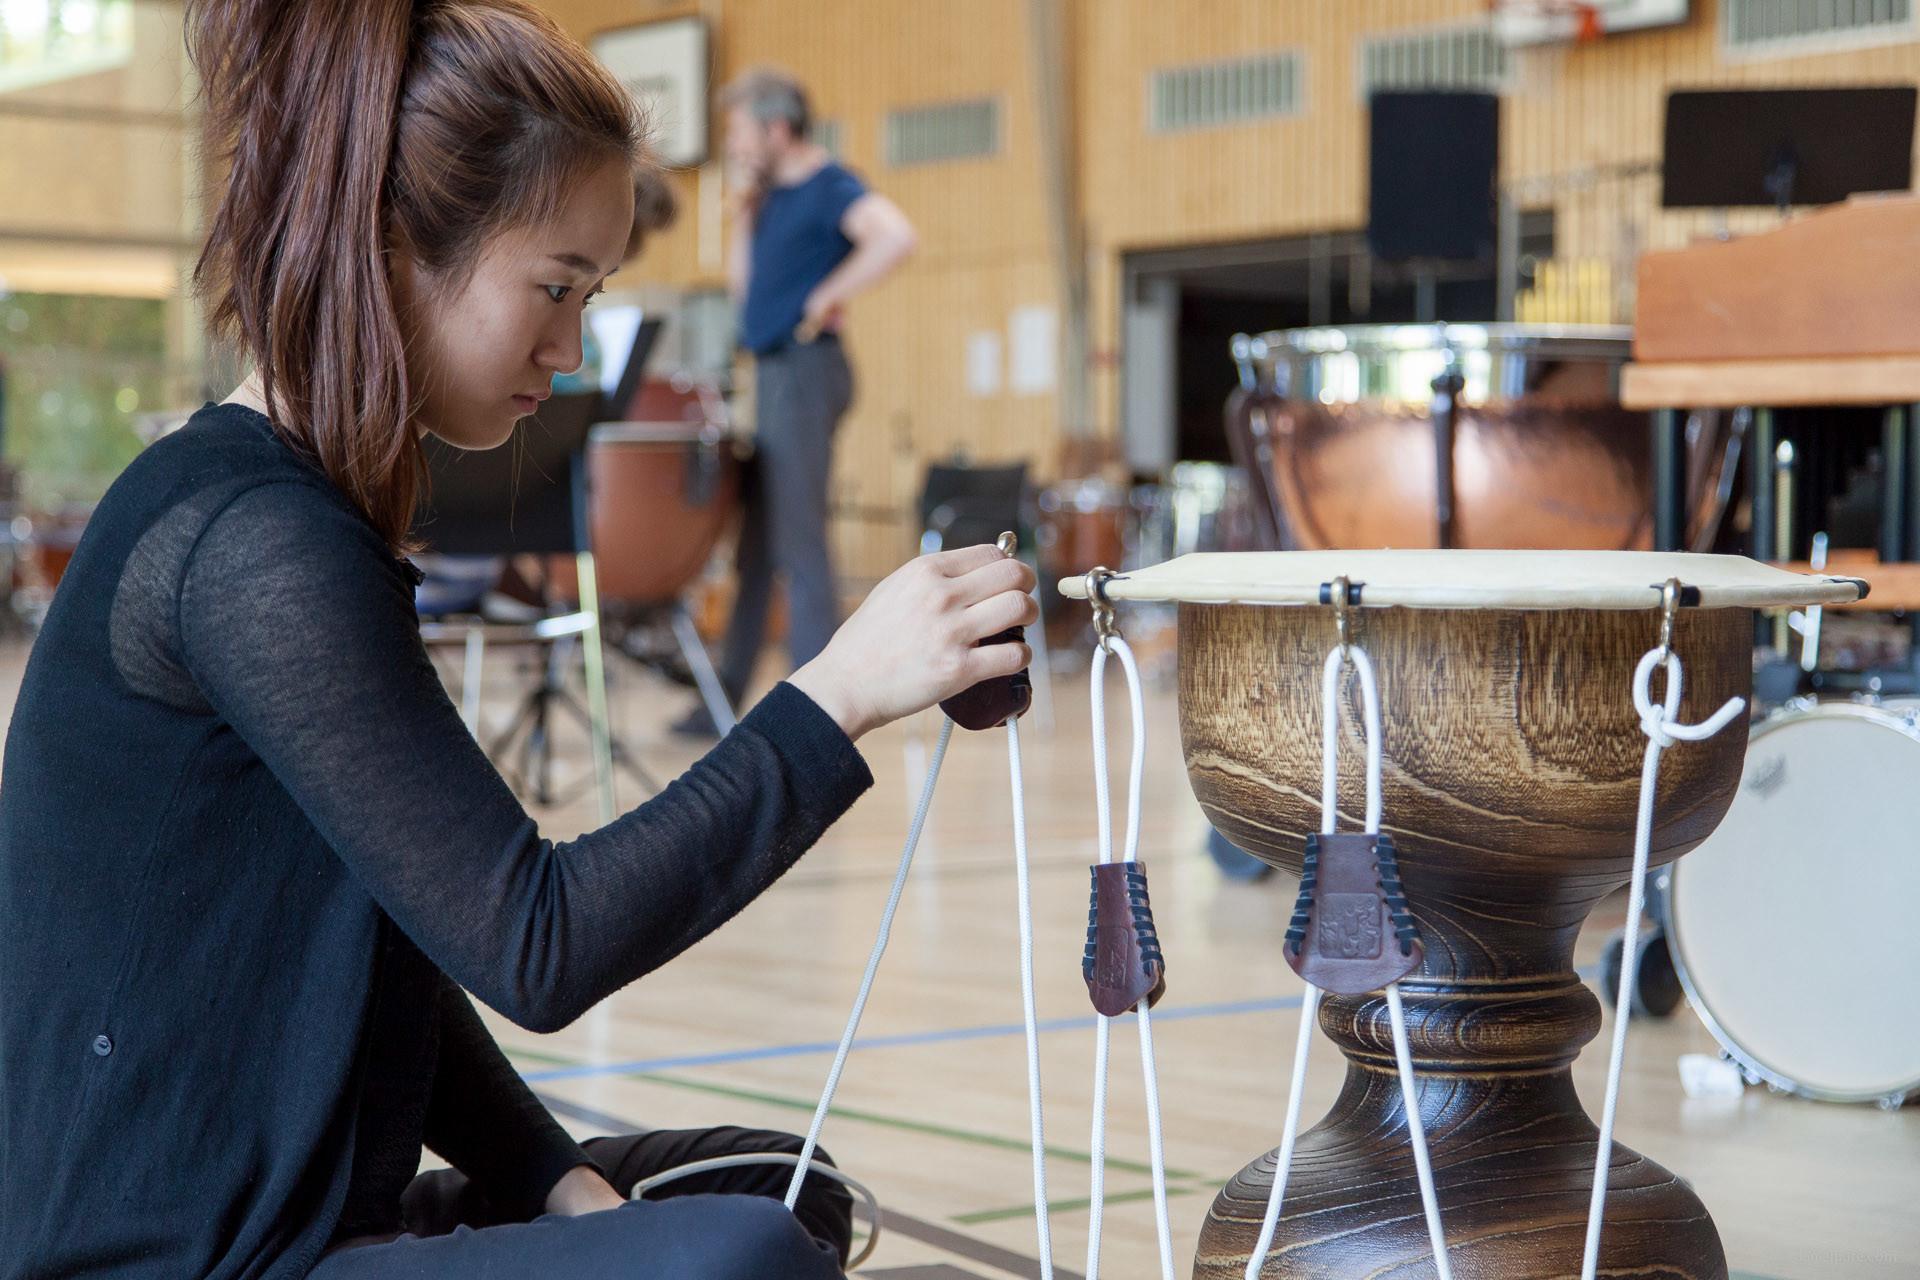 Percussion Ensemble Workshop - Edith Stein Schule